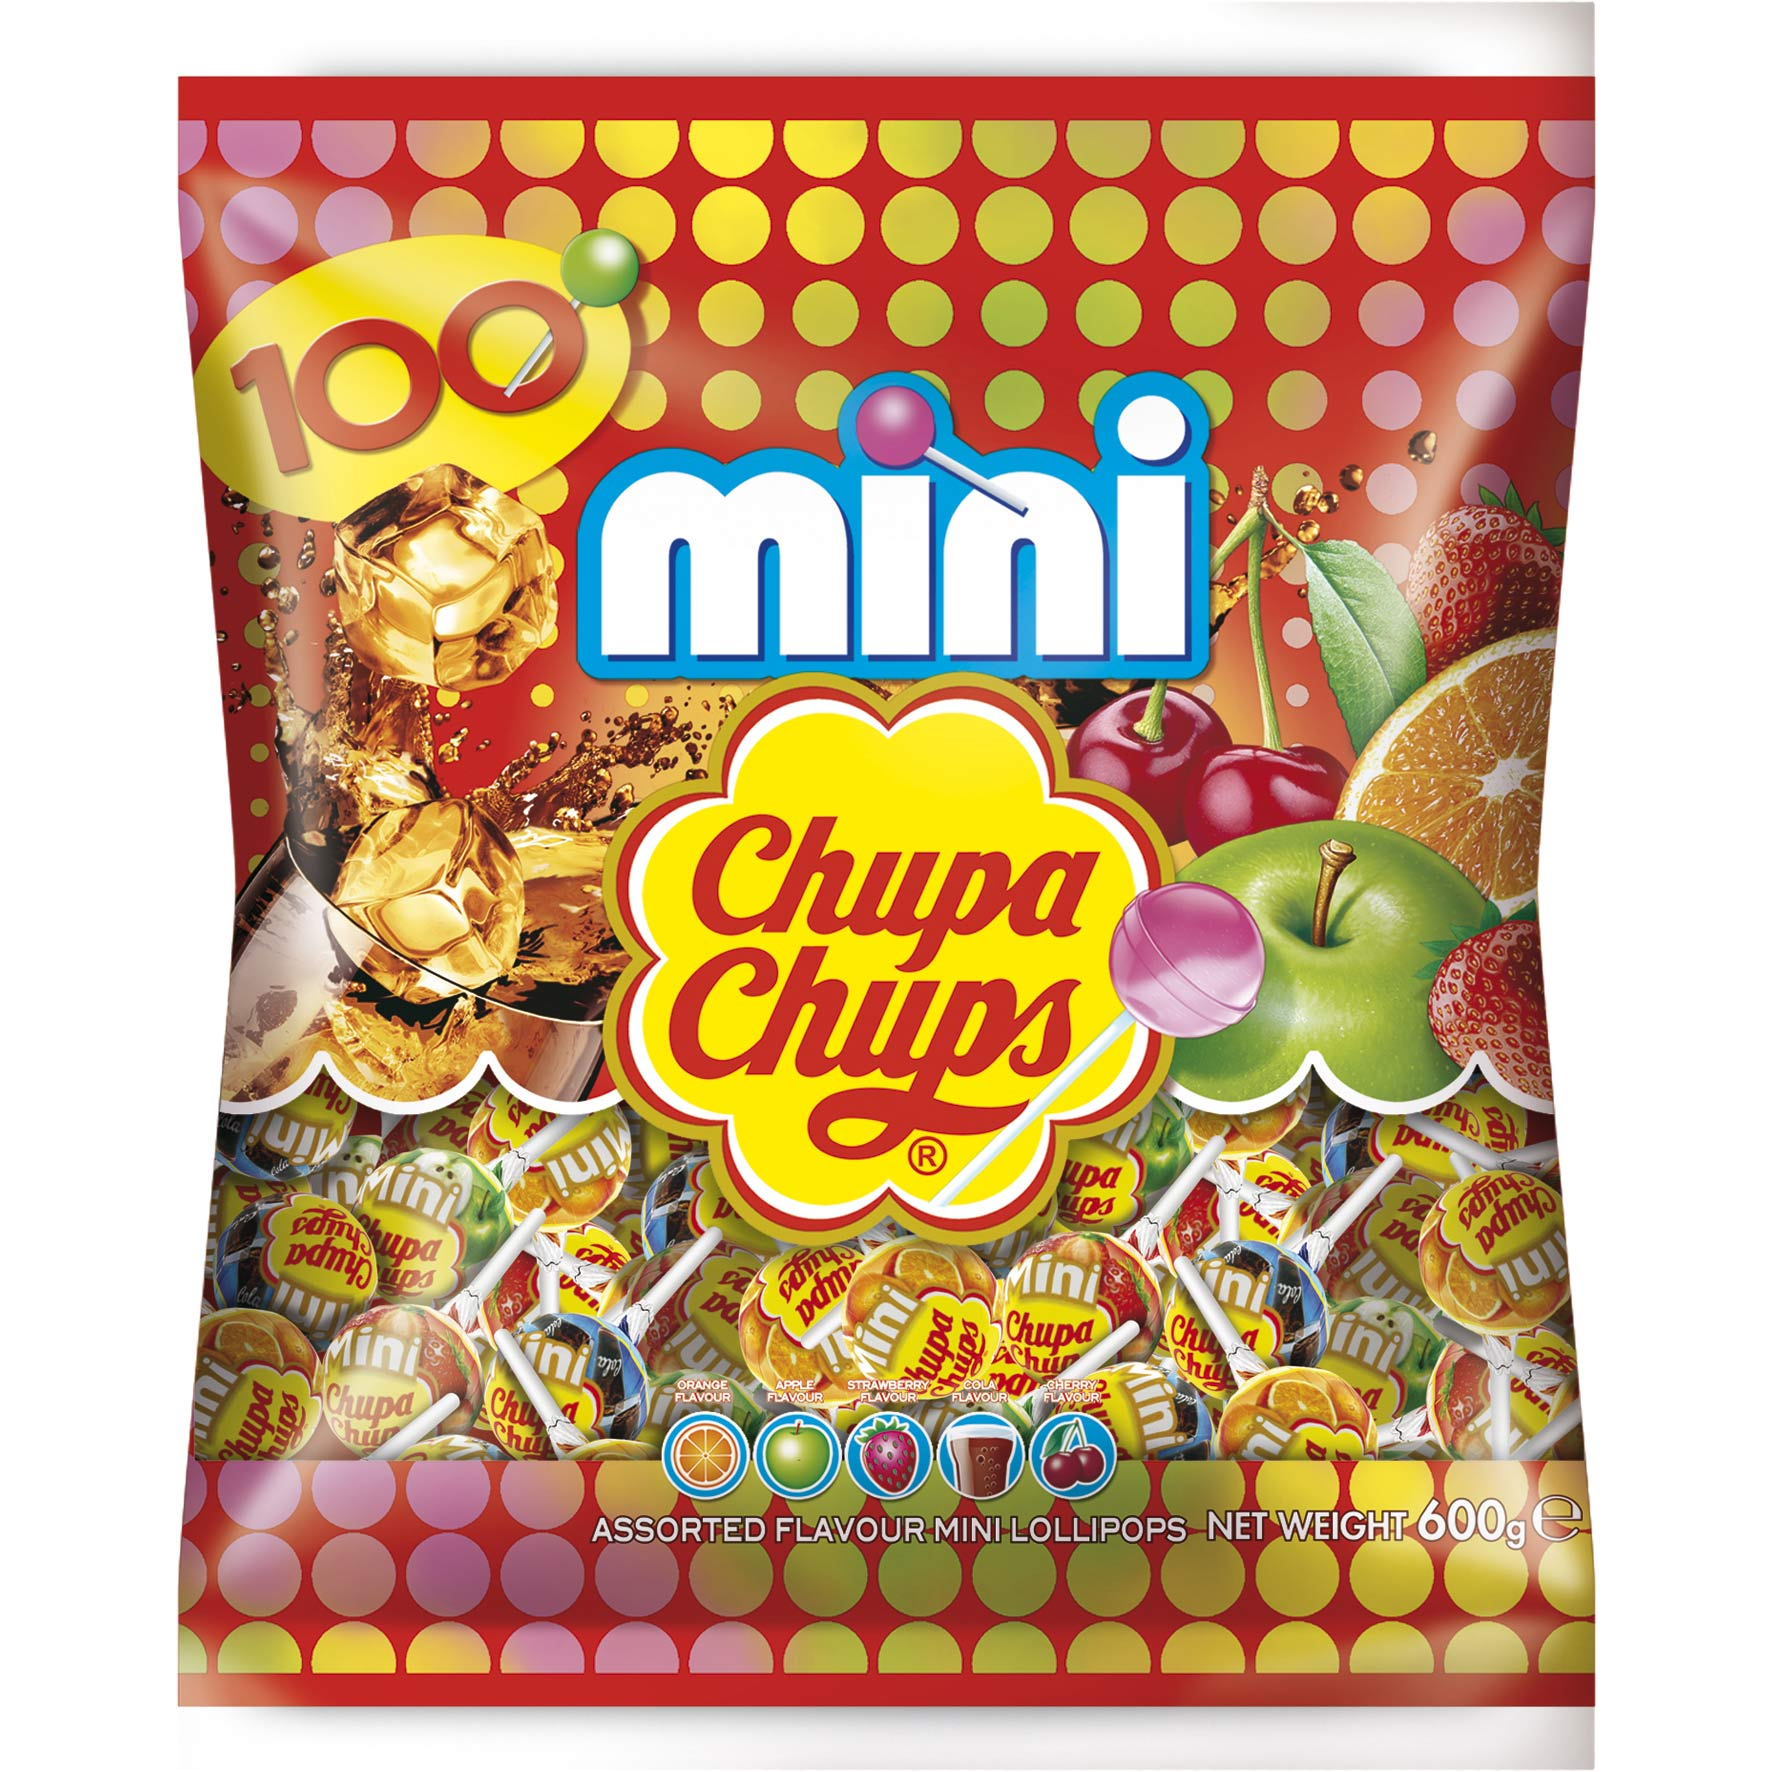 Chupa chups mini 100er online kaufen im world of sweets shop - Housse de couette chupa chups ...